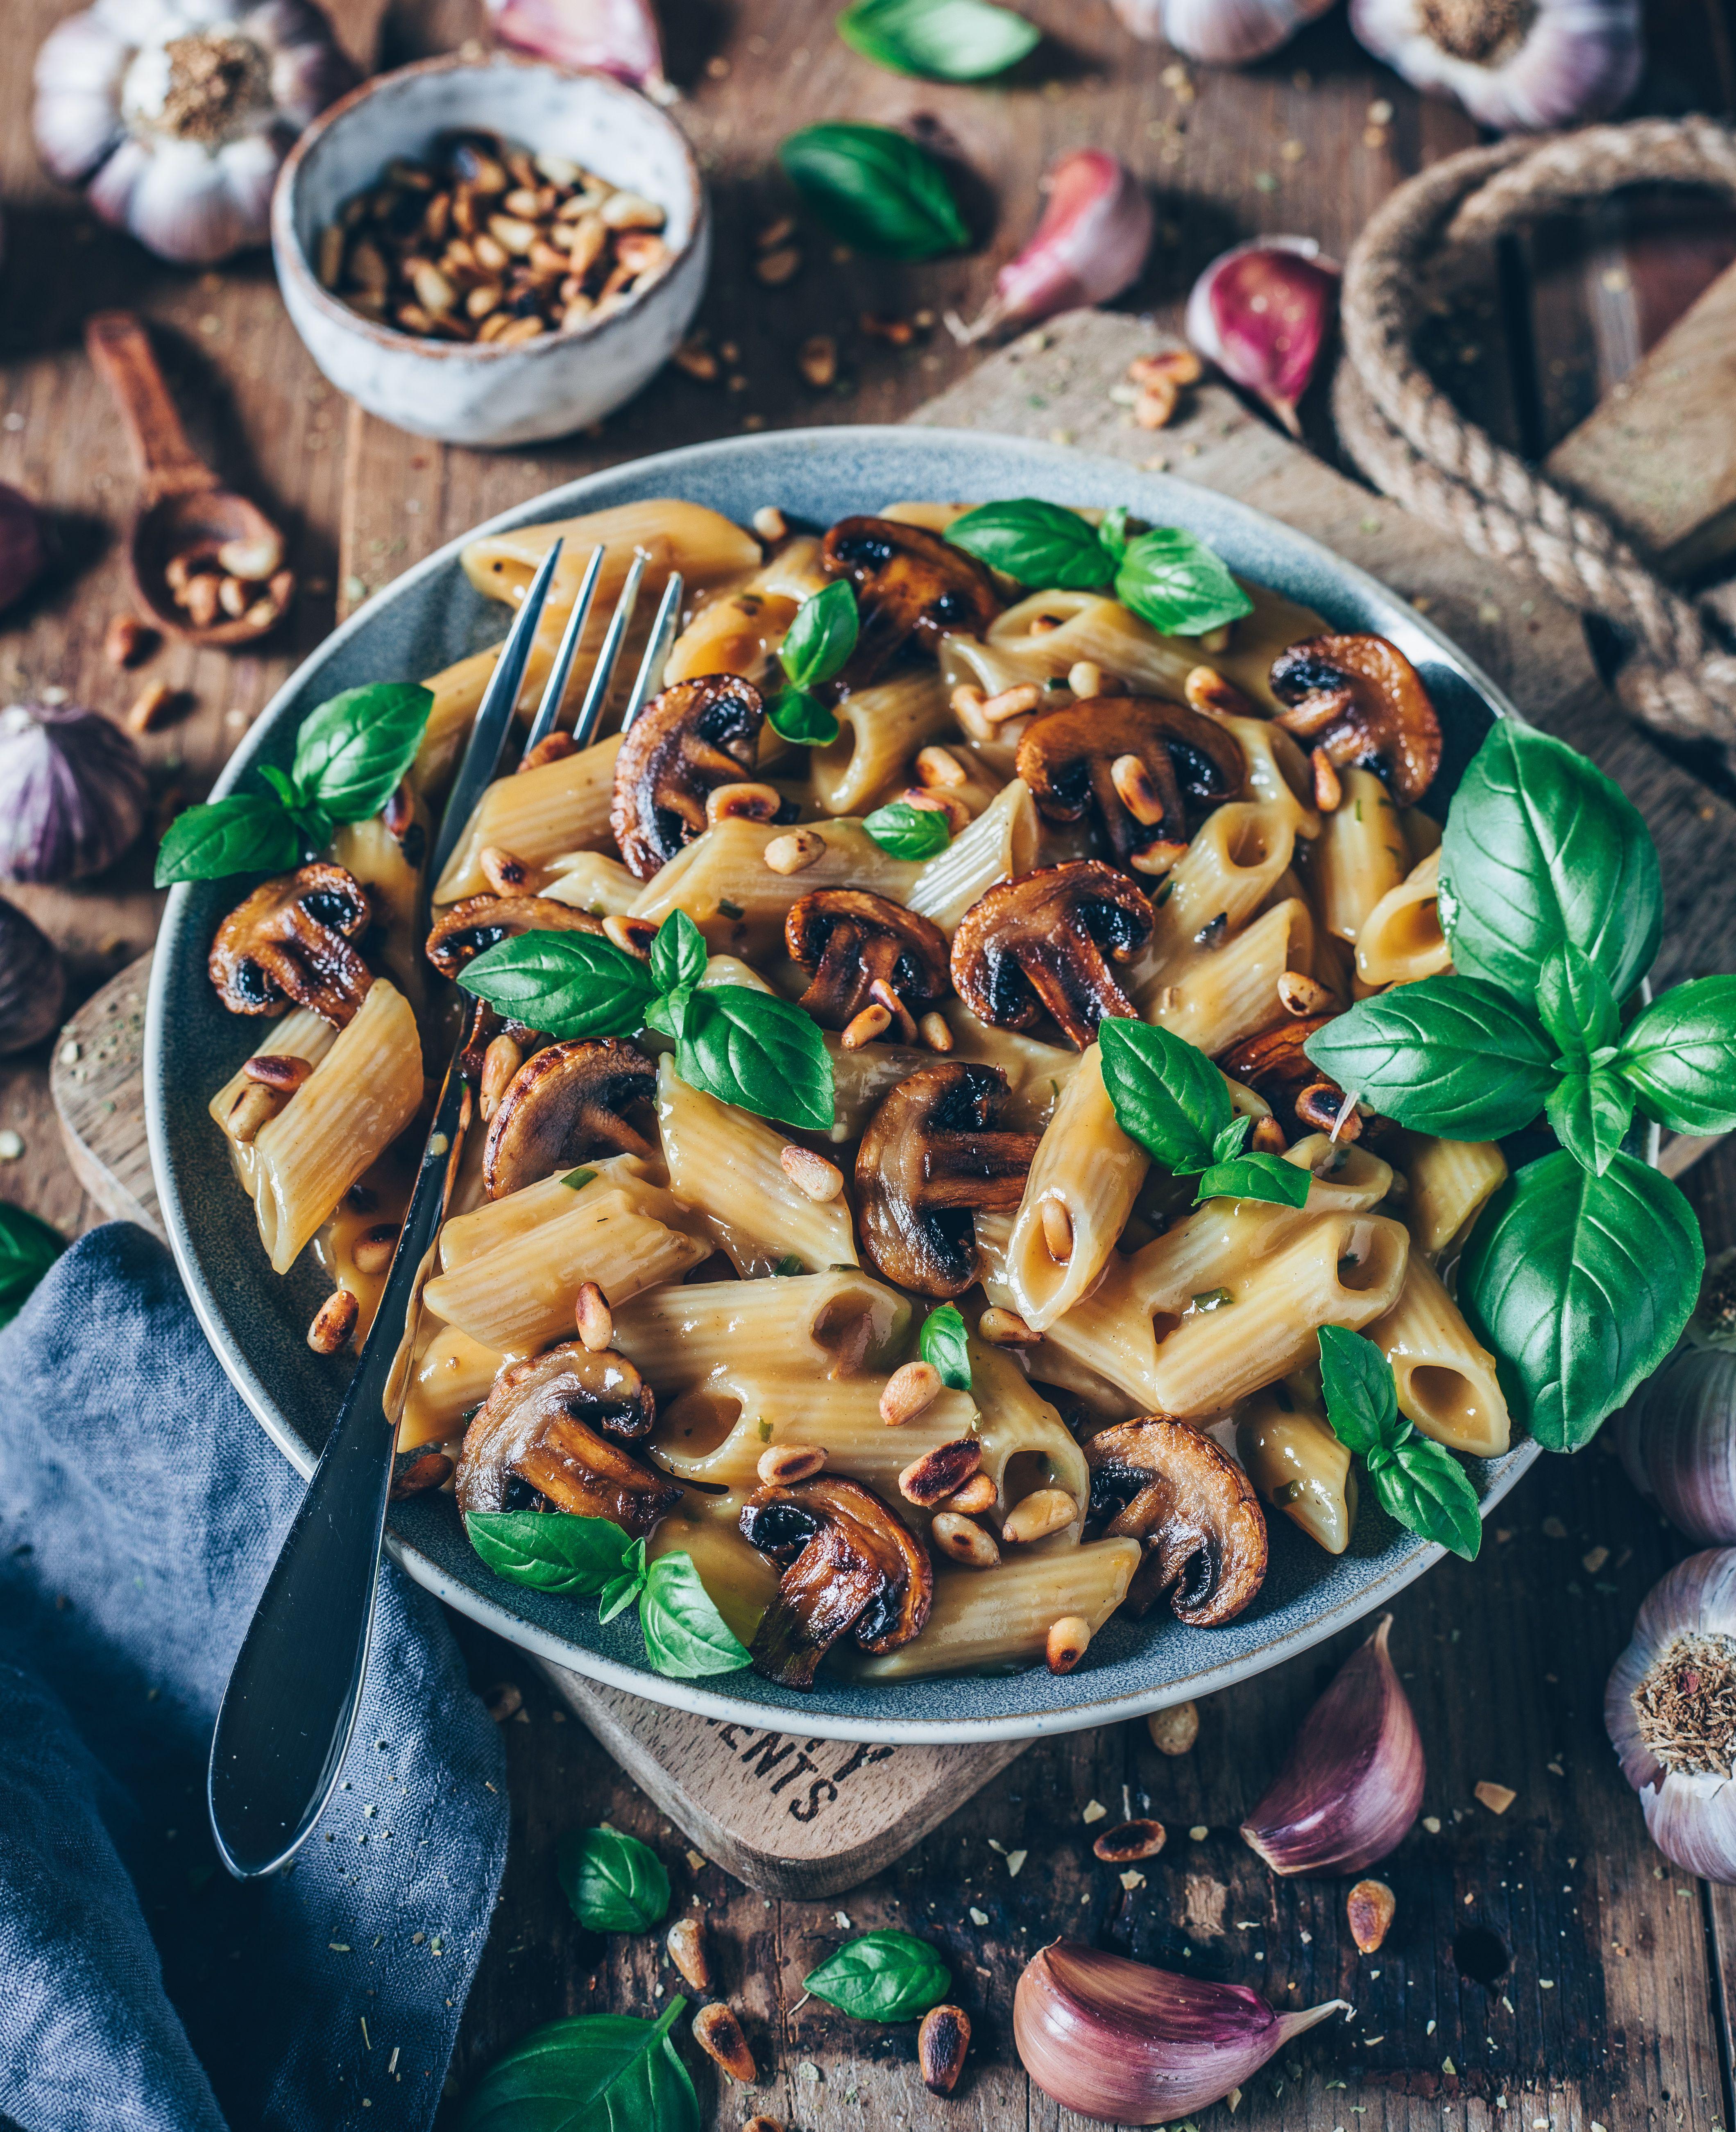 Creamy Mushroom Pasta Vegan Béchamel Sauce